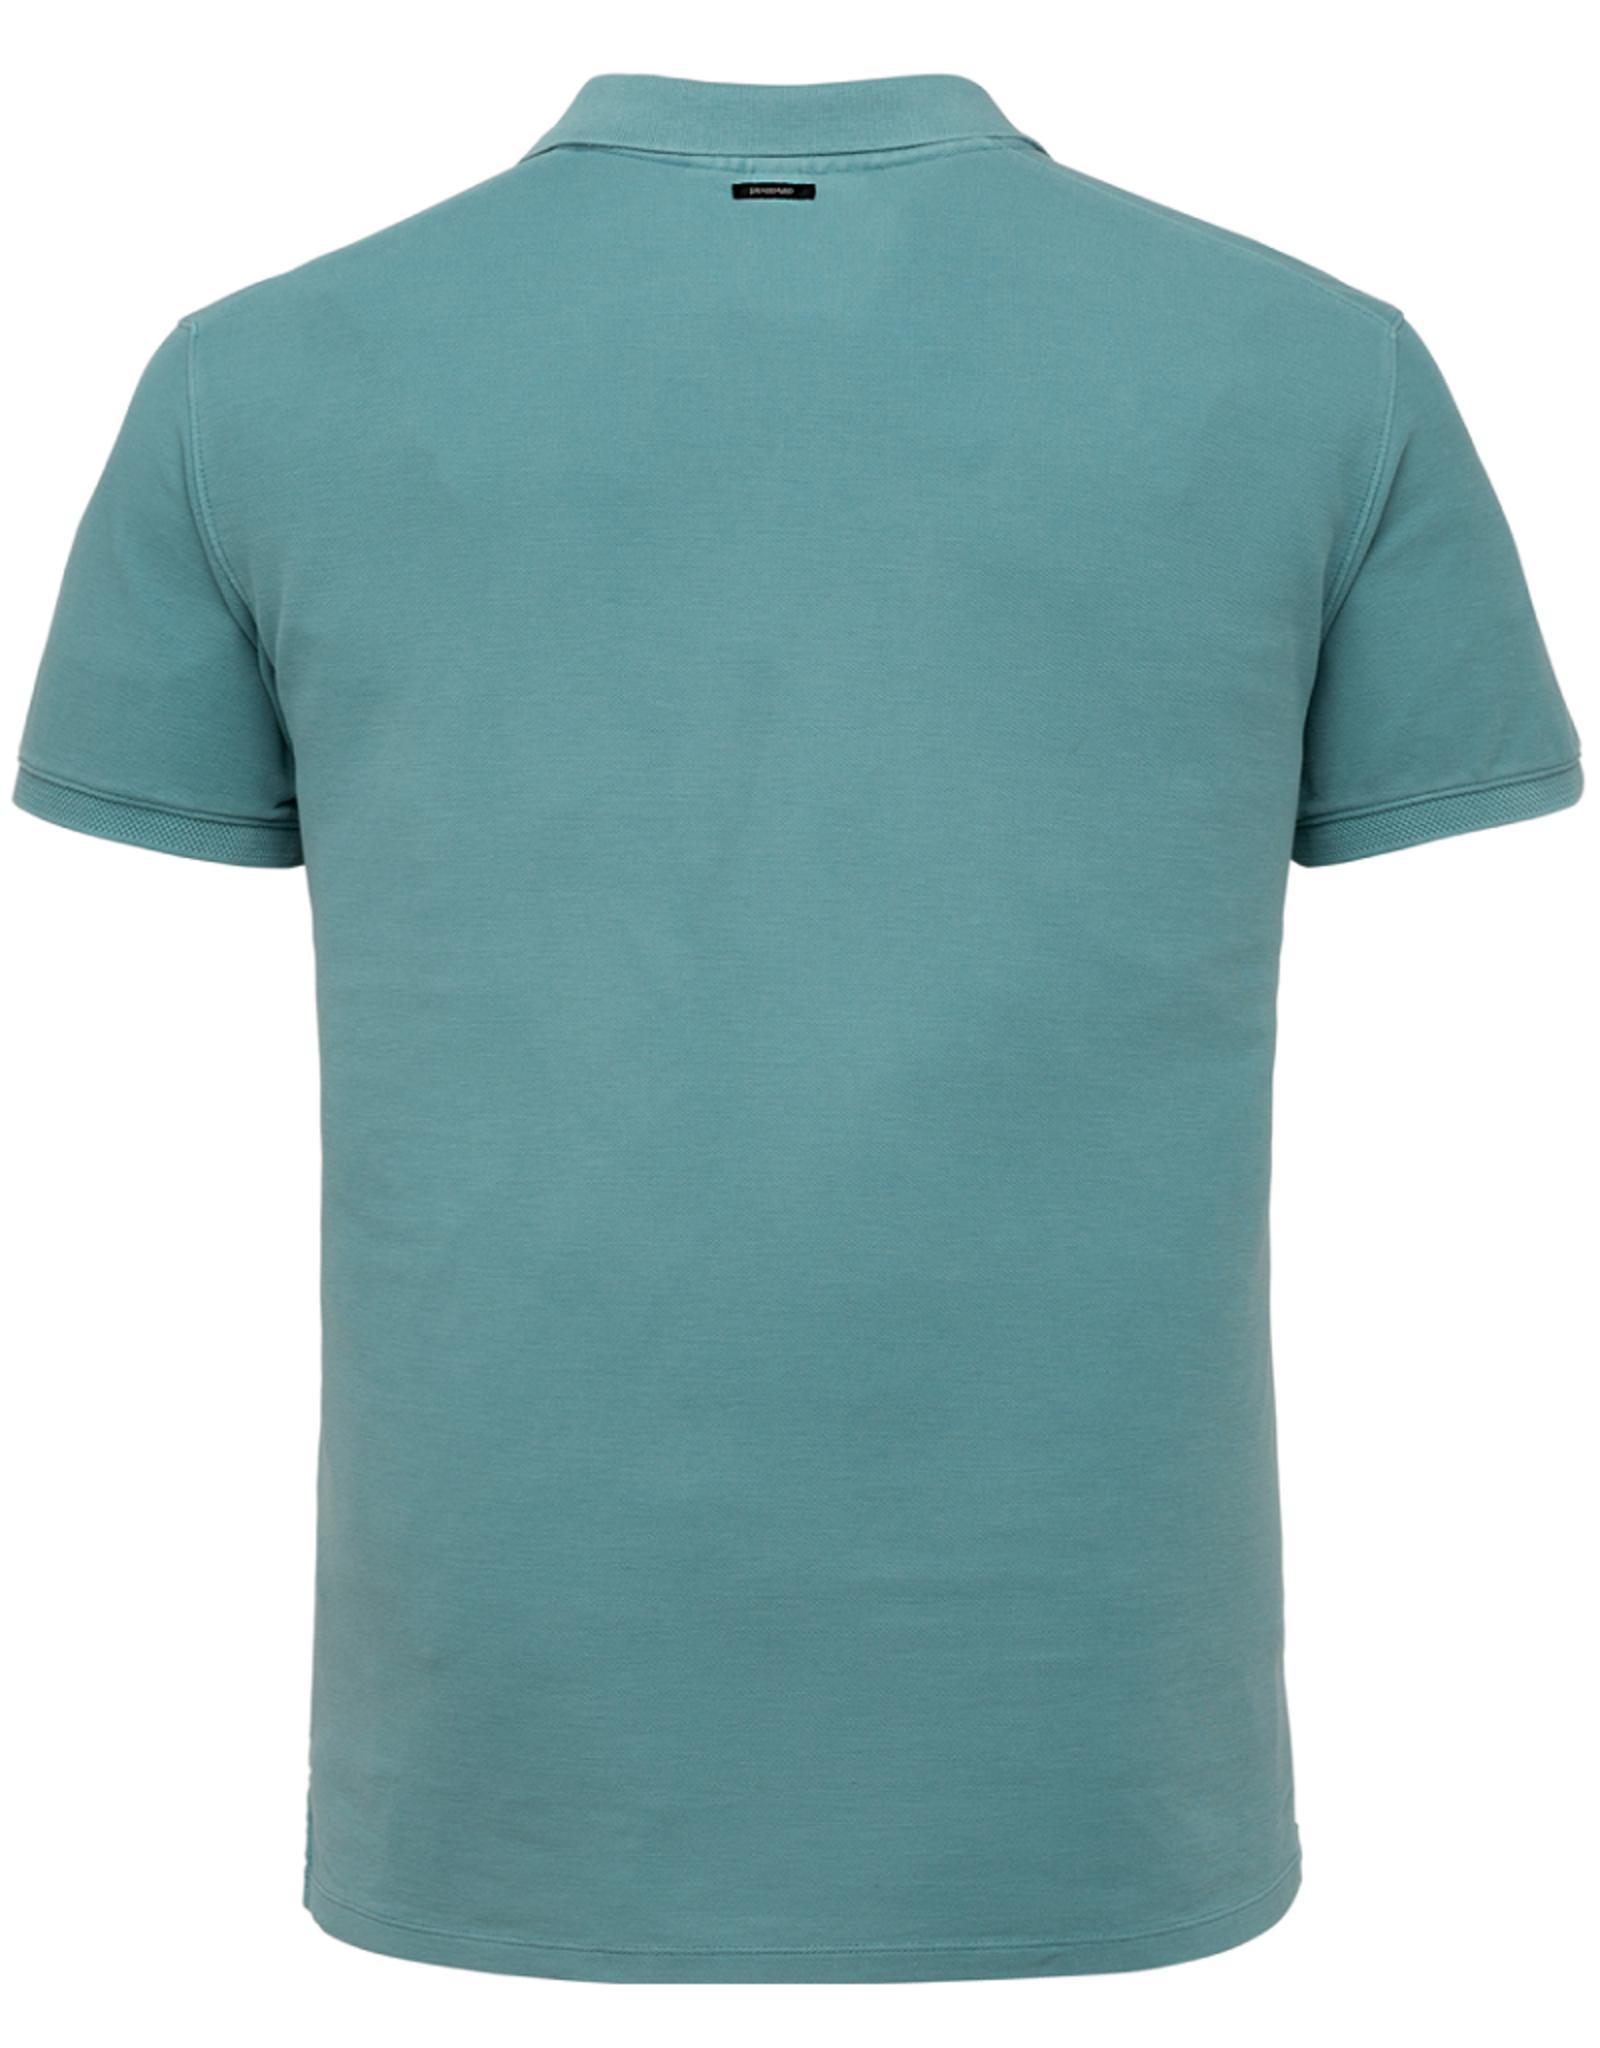 Vanguard Vanguard short sleeve polopique garment dye 5133